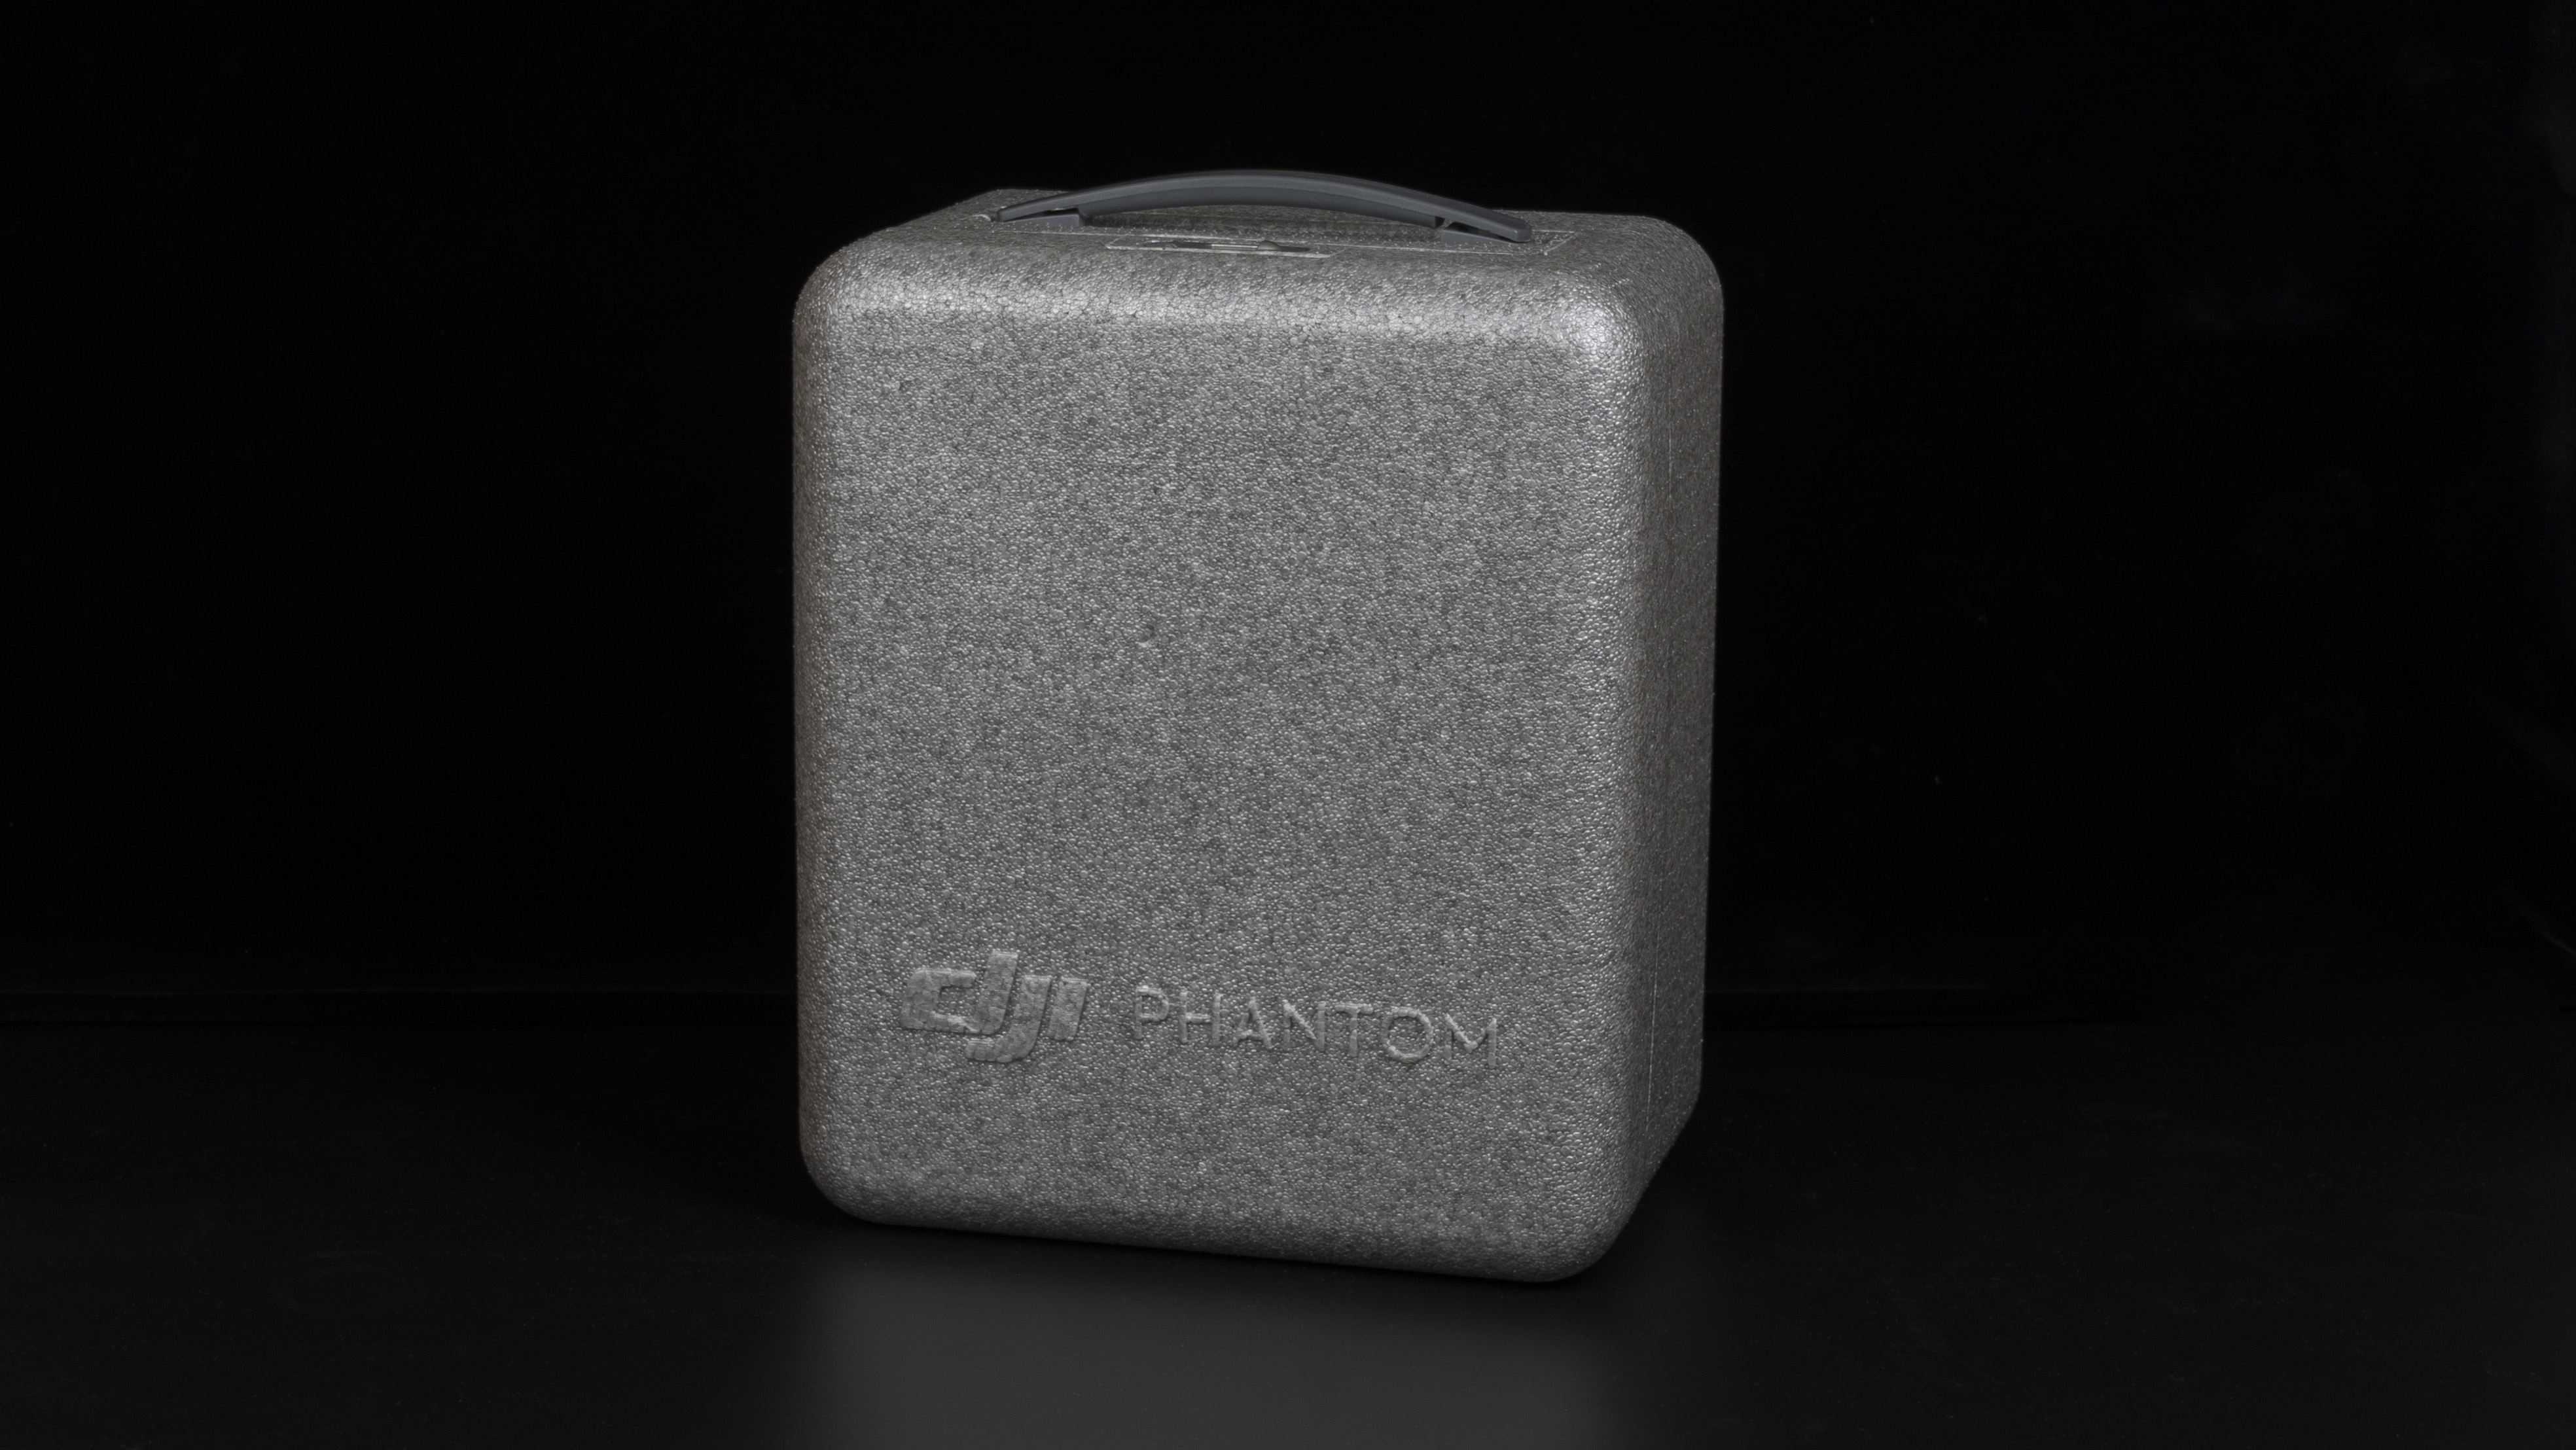 PHANTOM 4 PRO V2.0评测(一):优点显著的健身器材